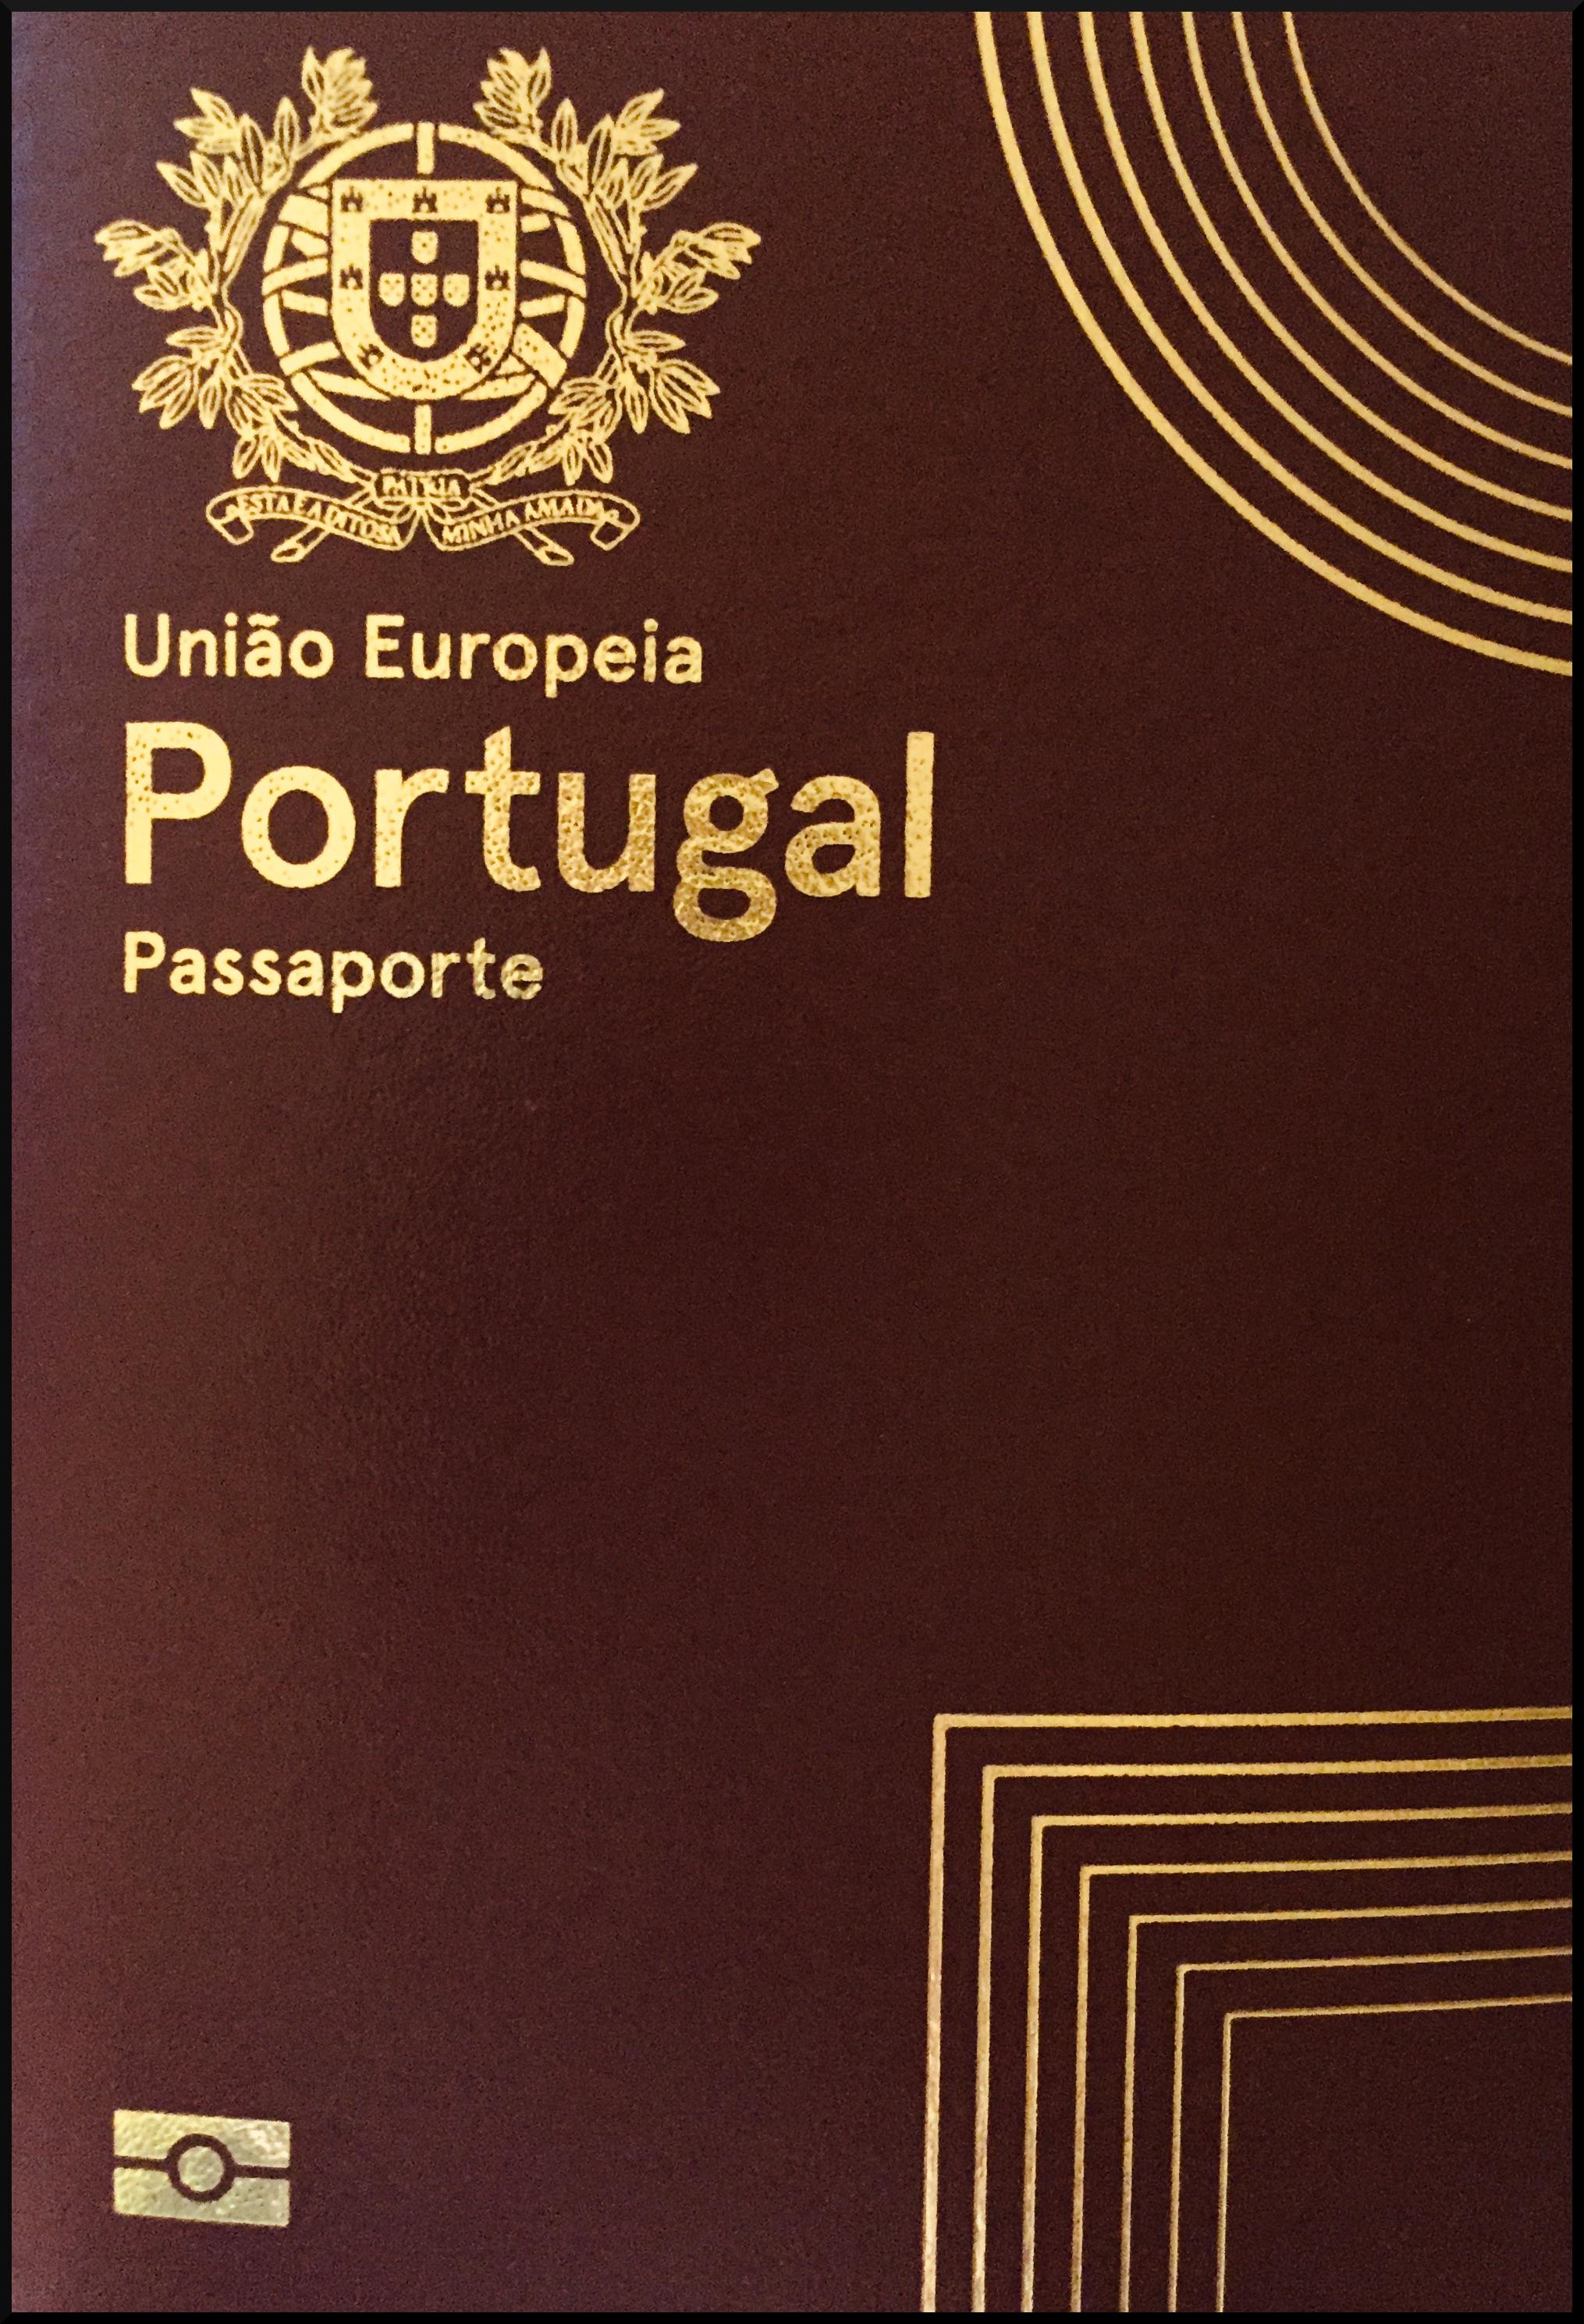 Паспорт Португалии